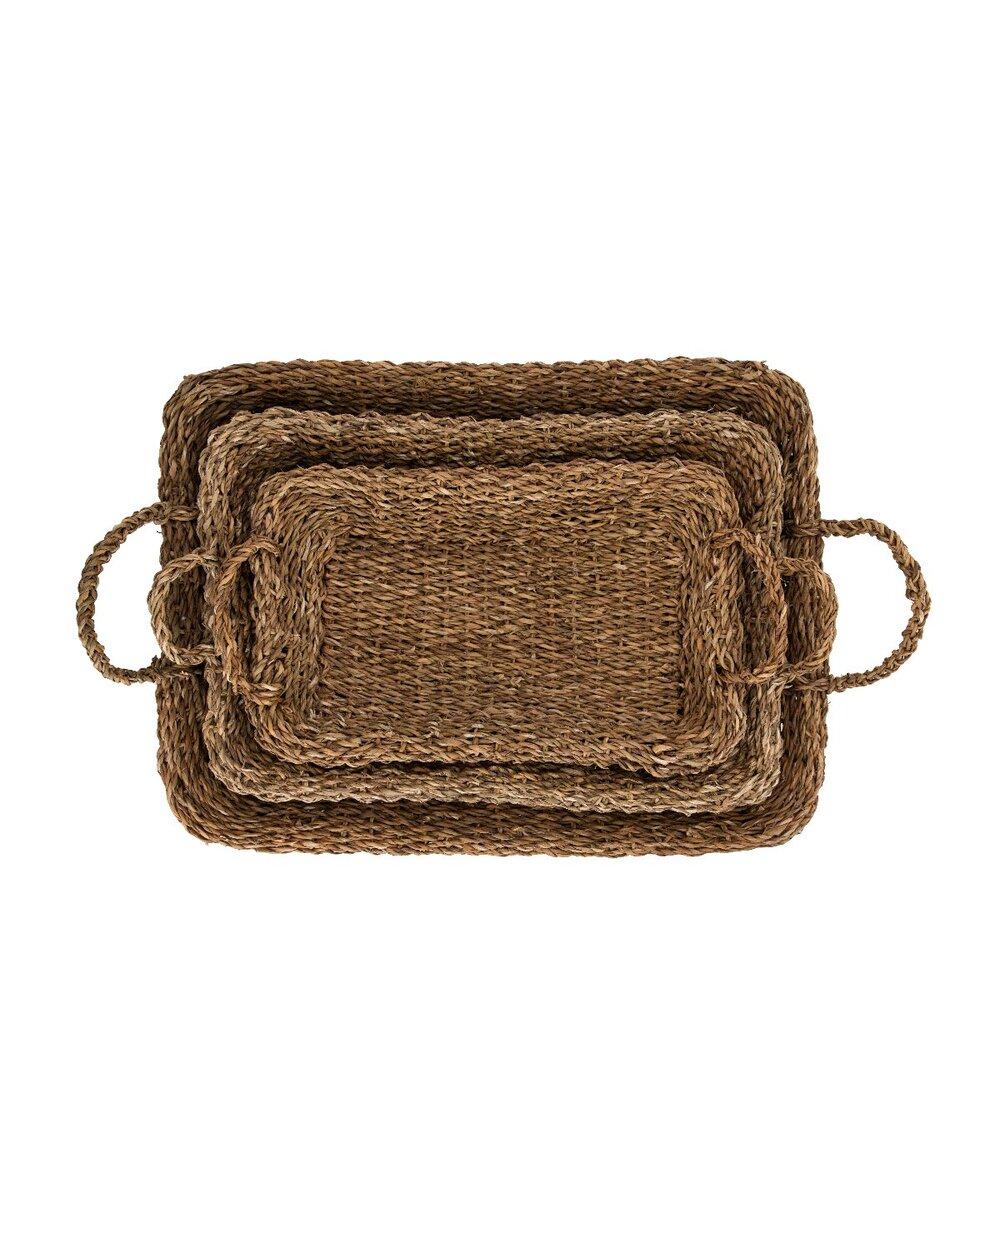 Seagrass_Catchall_Baskets_01.jpg